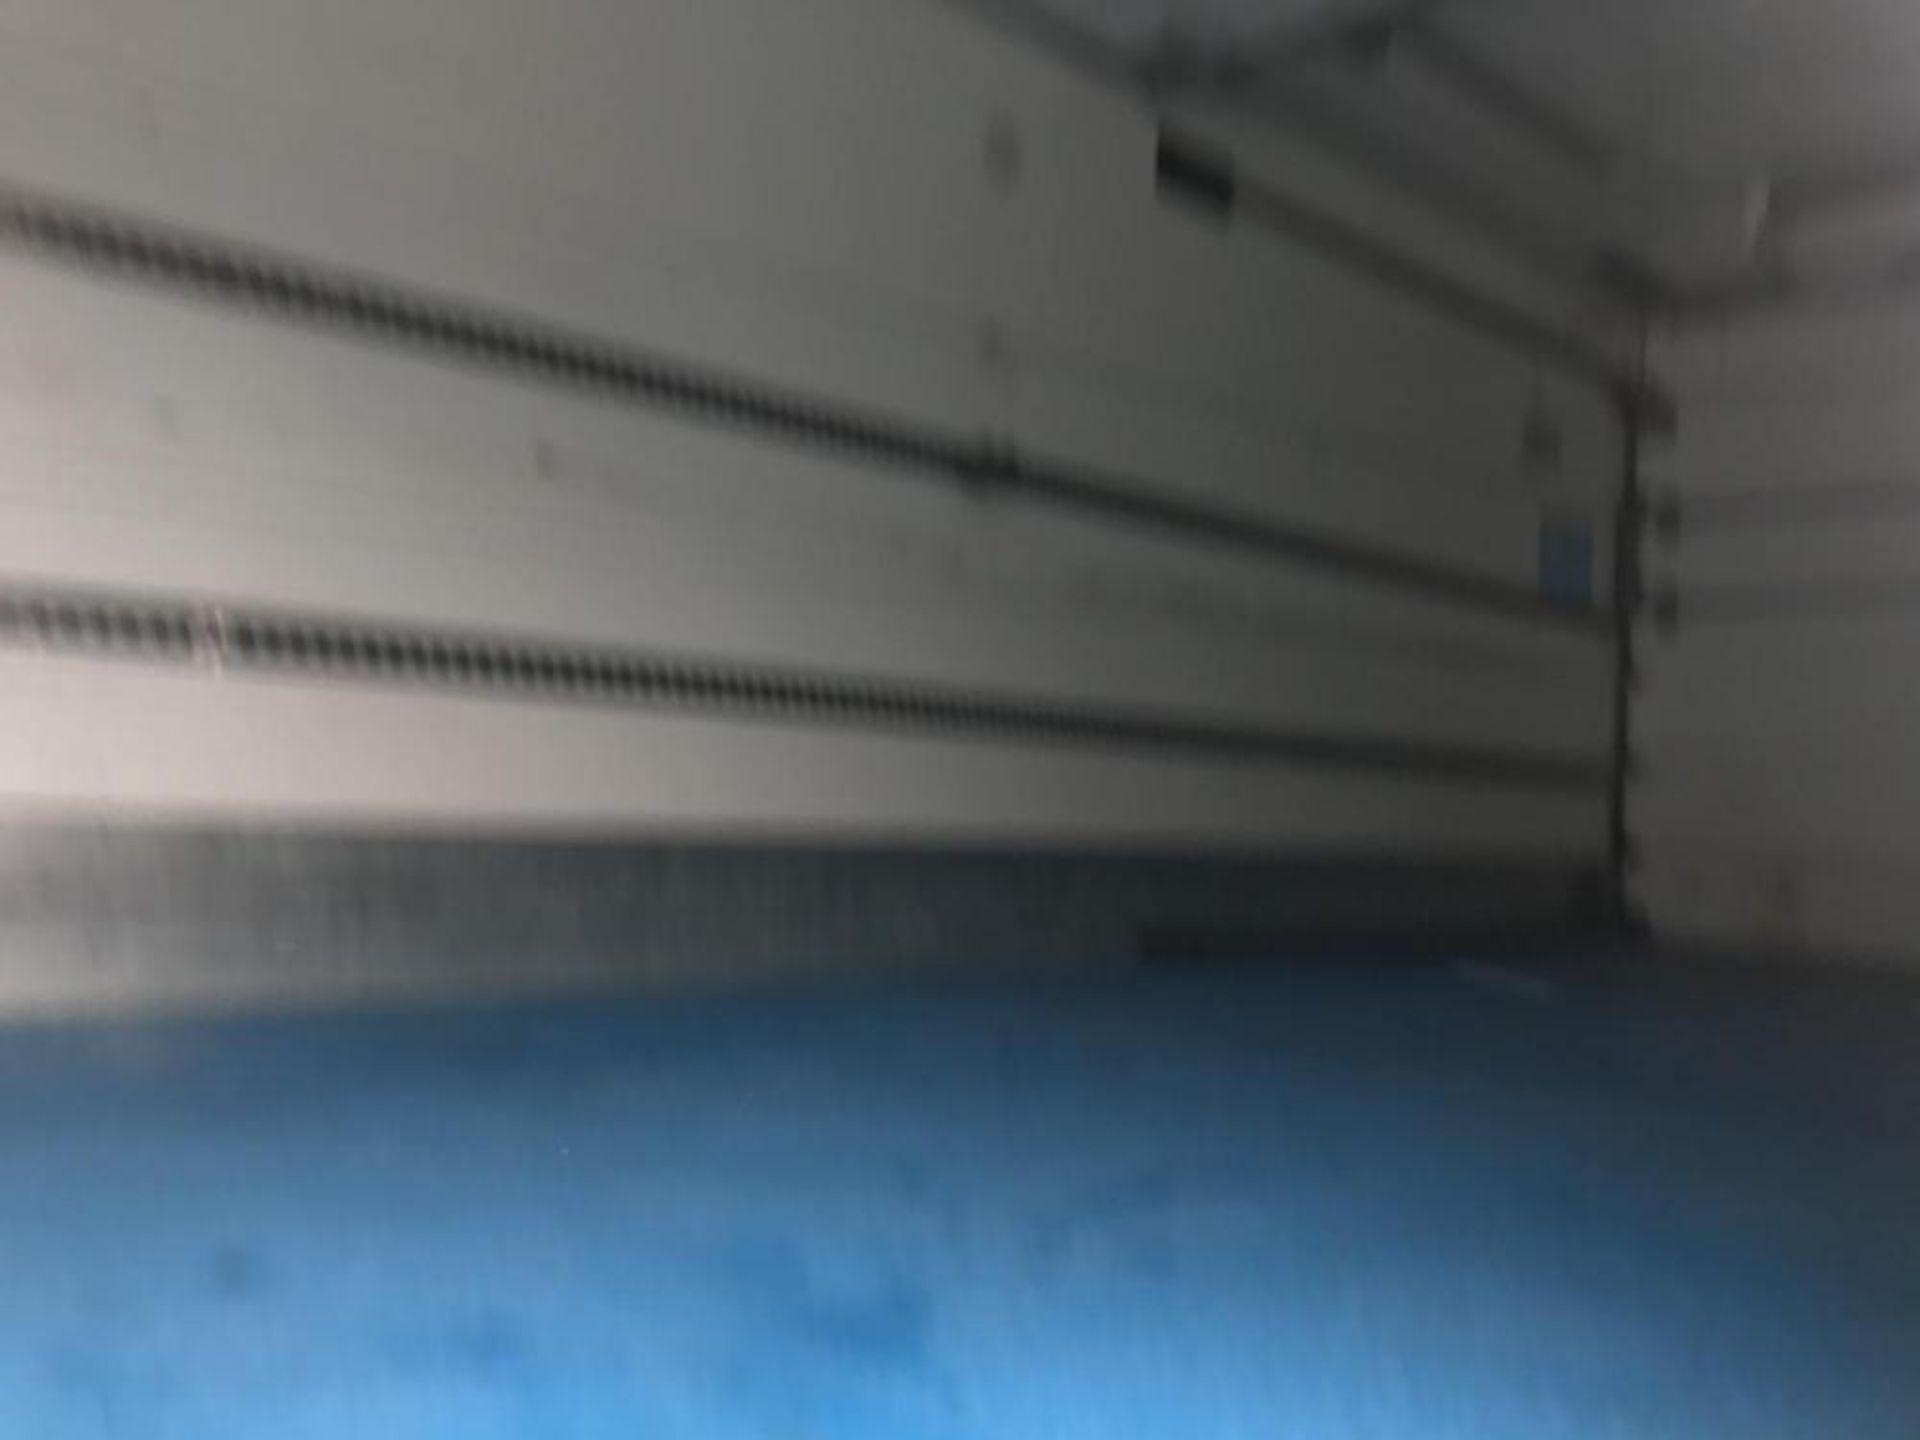 2013/63 REG MERCEDES-BENZ AXOR ATEGO 1824L DAY WHITE FRIDGE BOX TAIL LIFT AIR SUSPENSION *PLUS VAT* - Image 8 of 21